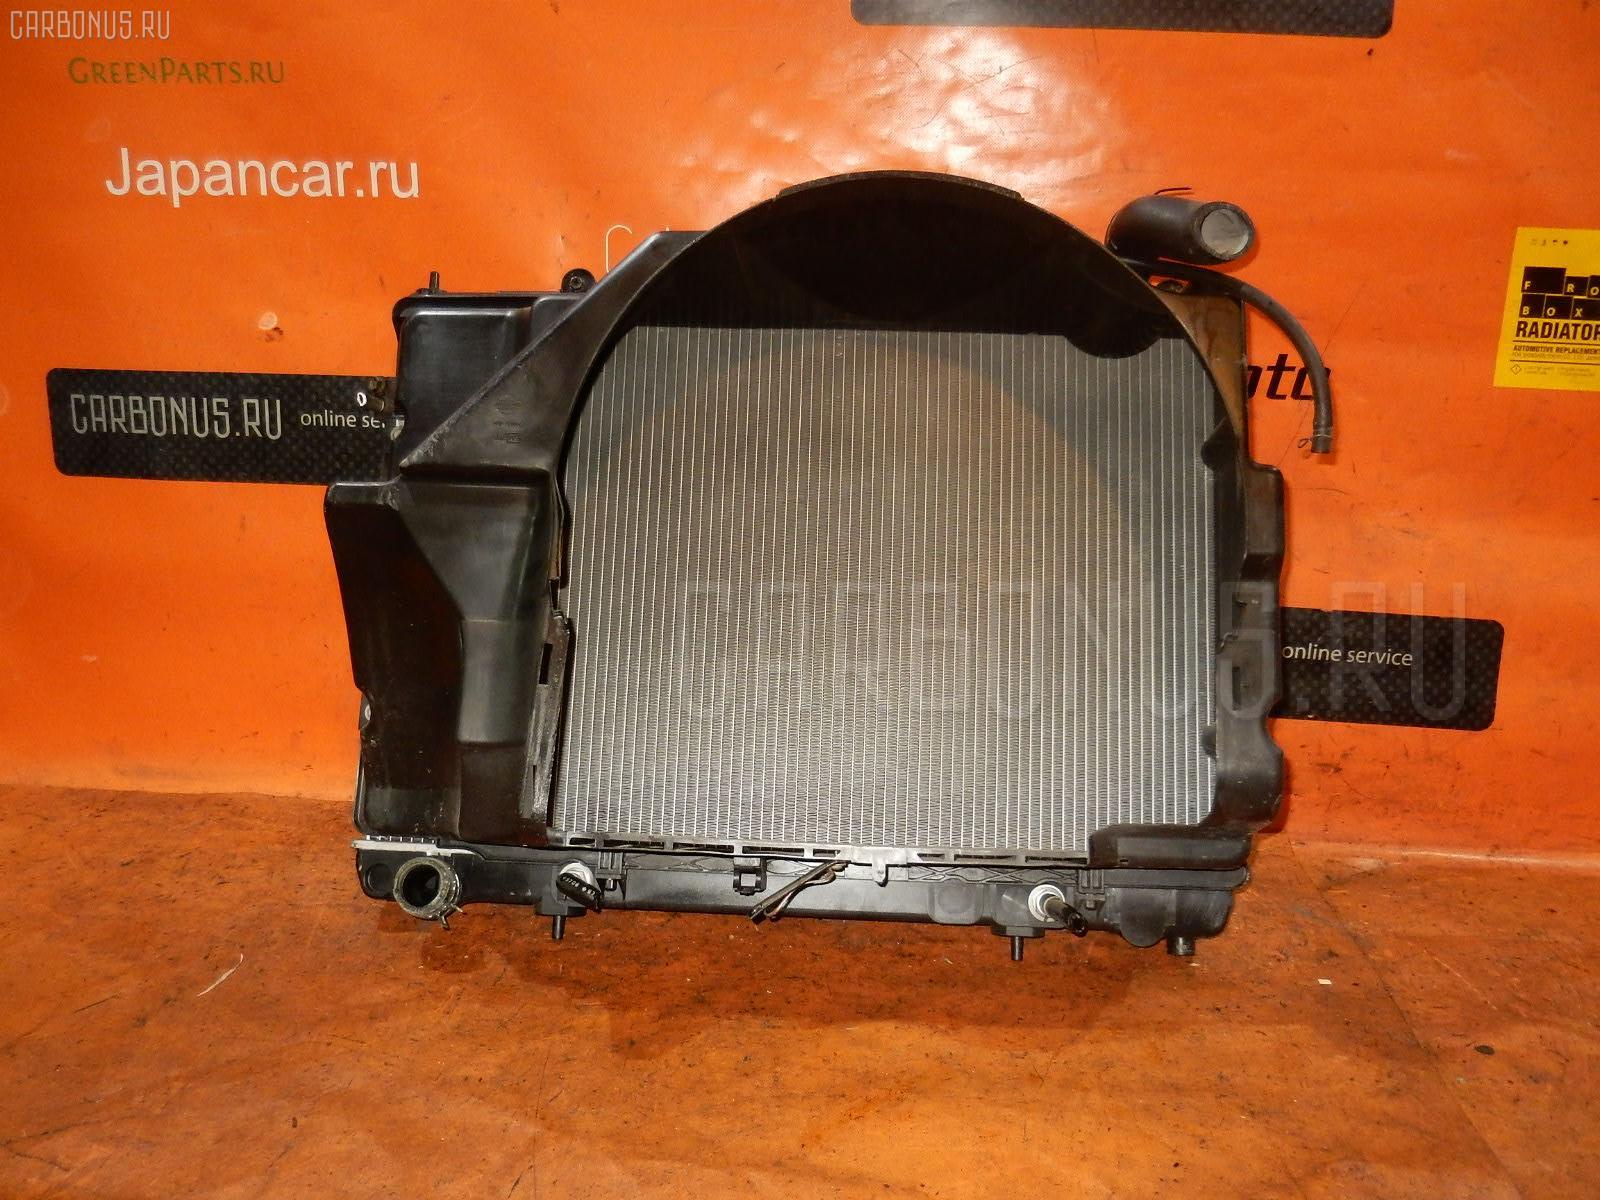 Радиатор ДВС NISSAN CEDRIC HY34 VQ30DET. Фото 5